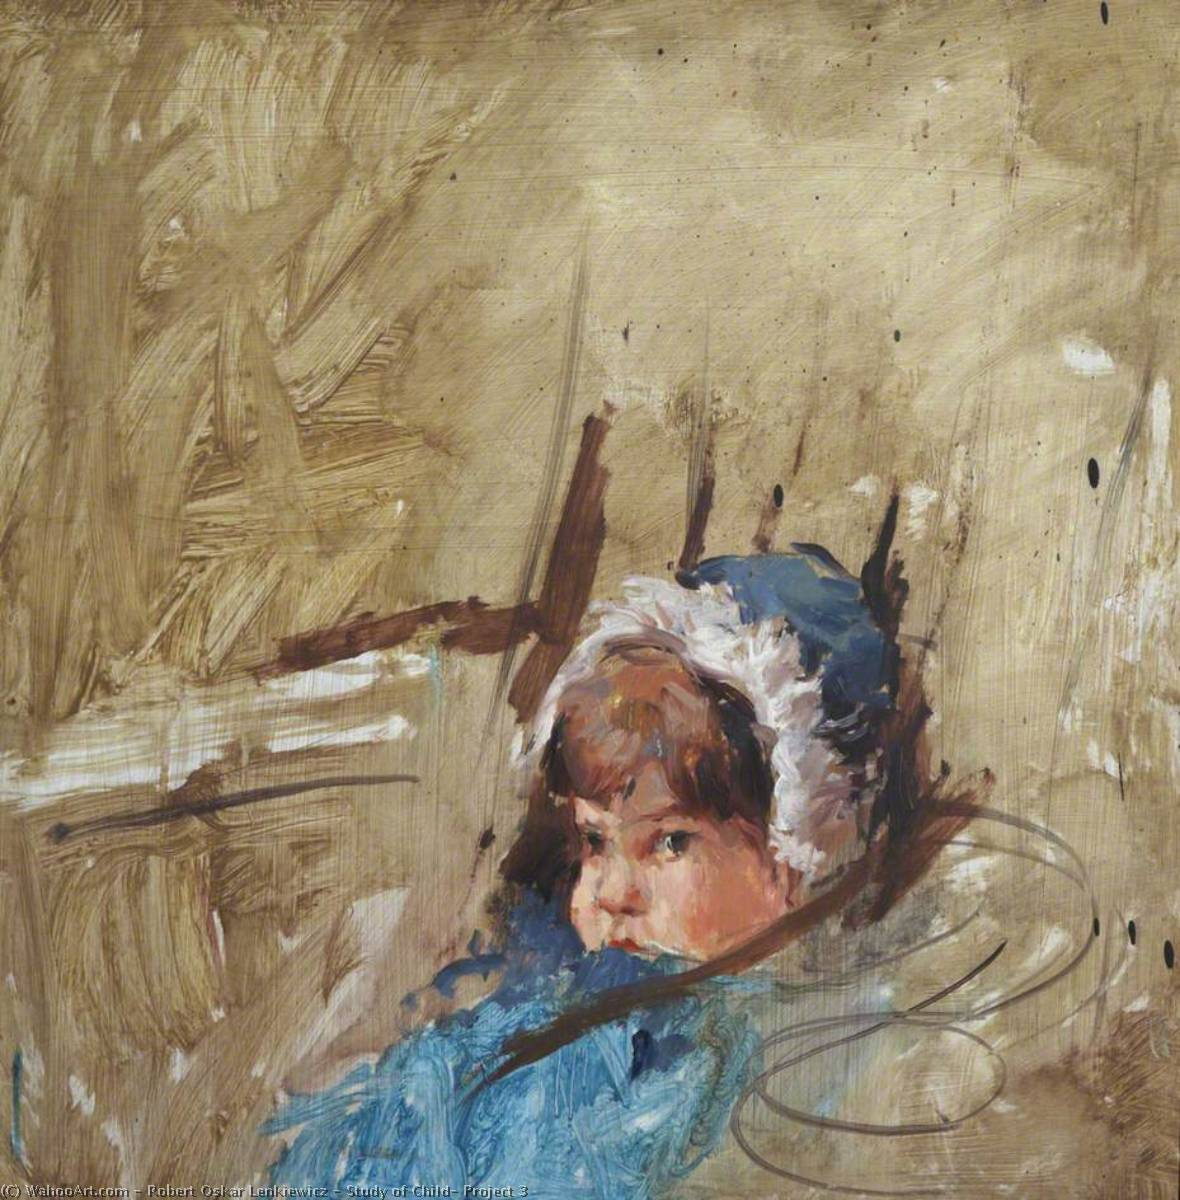 Wikioo.org - The Encyclopedia of Fine Arts - Painting, Artwork by Robert Oskar Lenkiewicz - Study of Child, Project 3